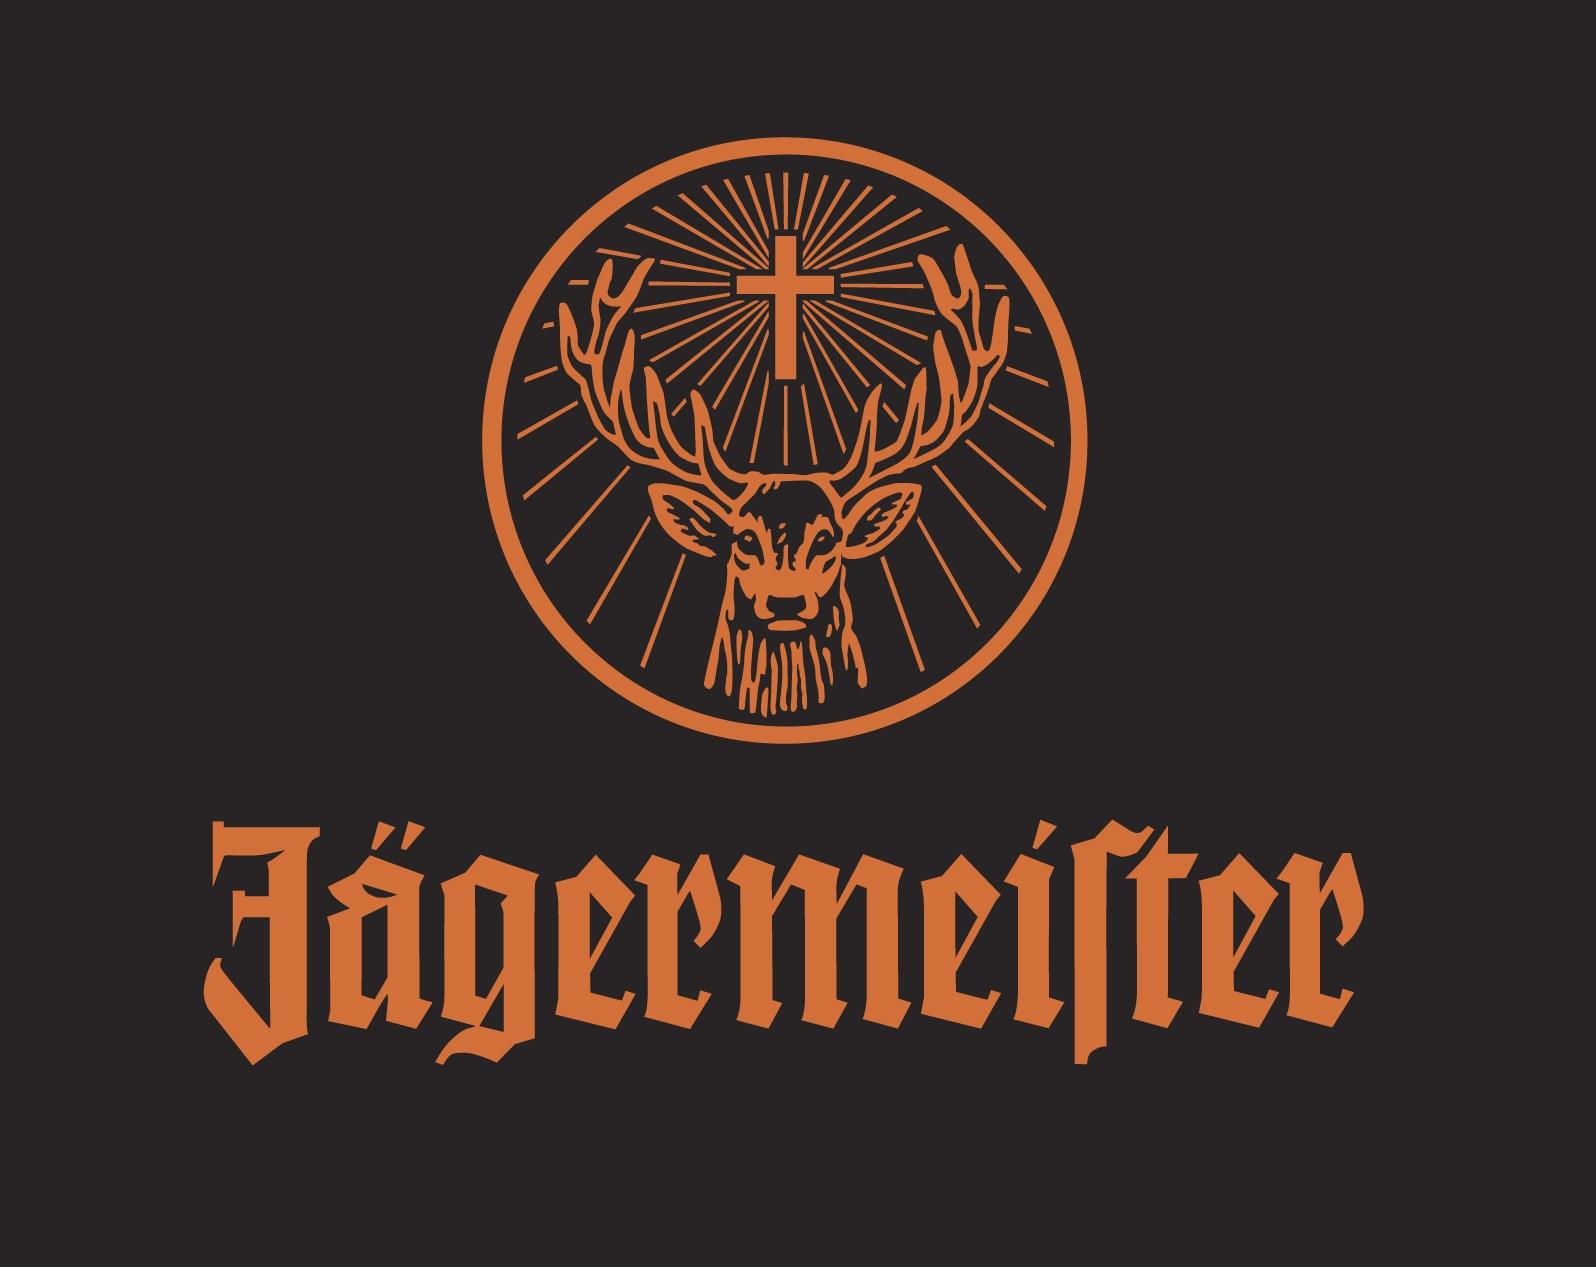 Jägermeister High Quality Background on Wallpapers Vista